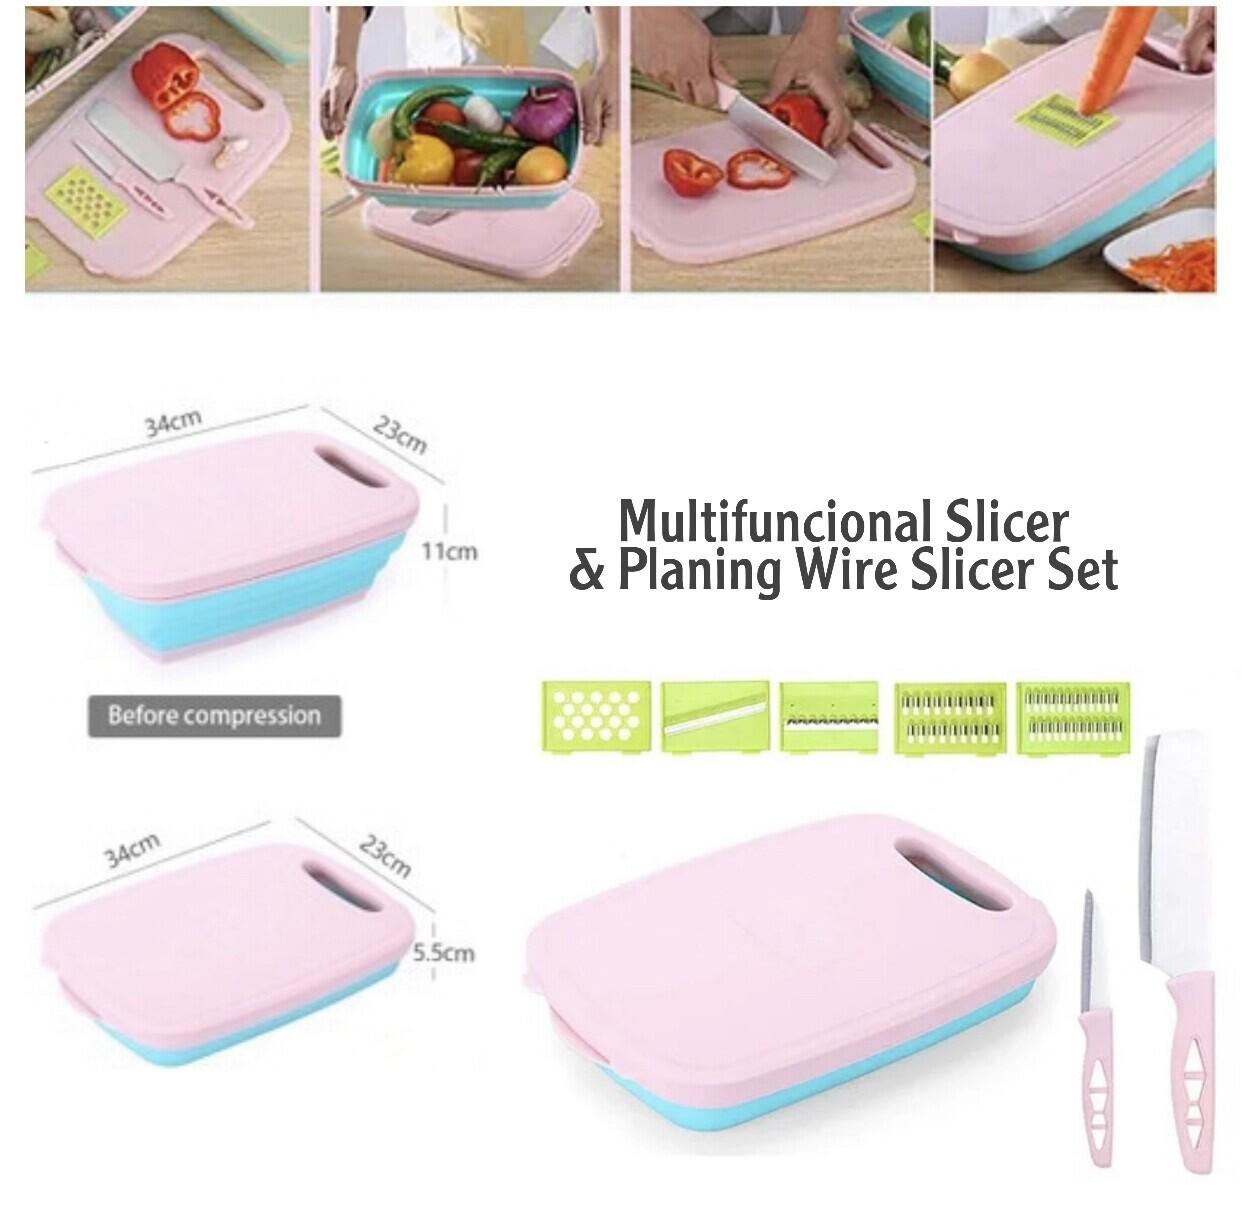 Multifuncional Slicer Set